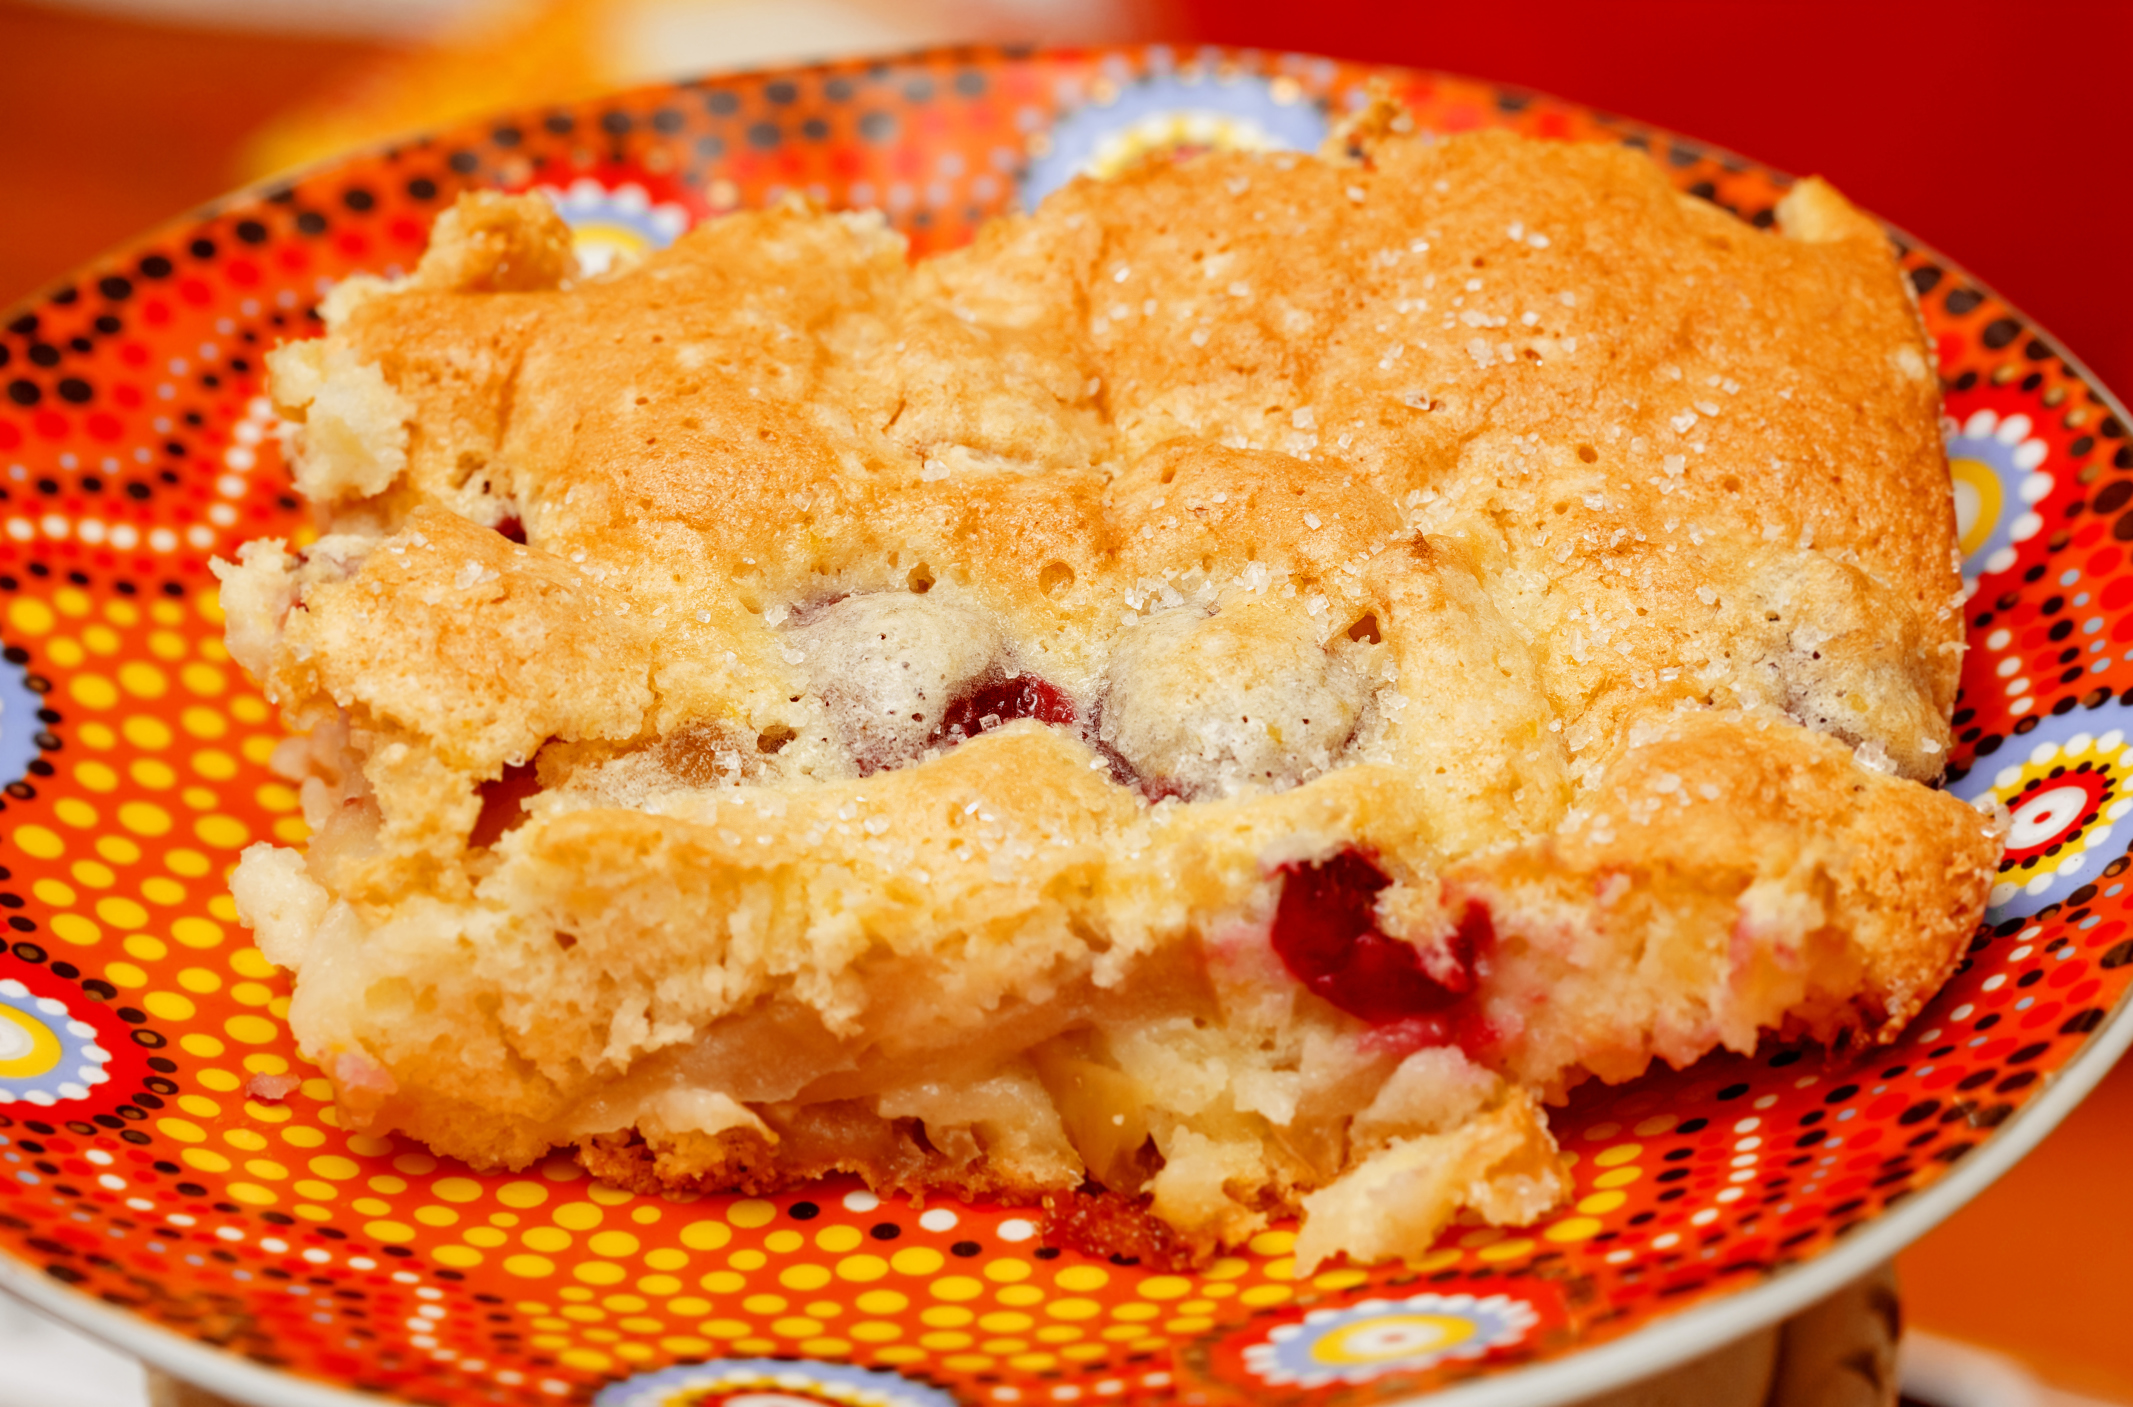 Pan dulce con cerezas